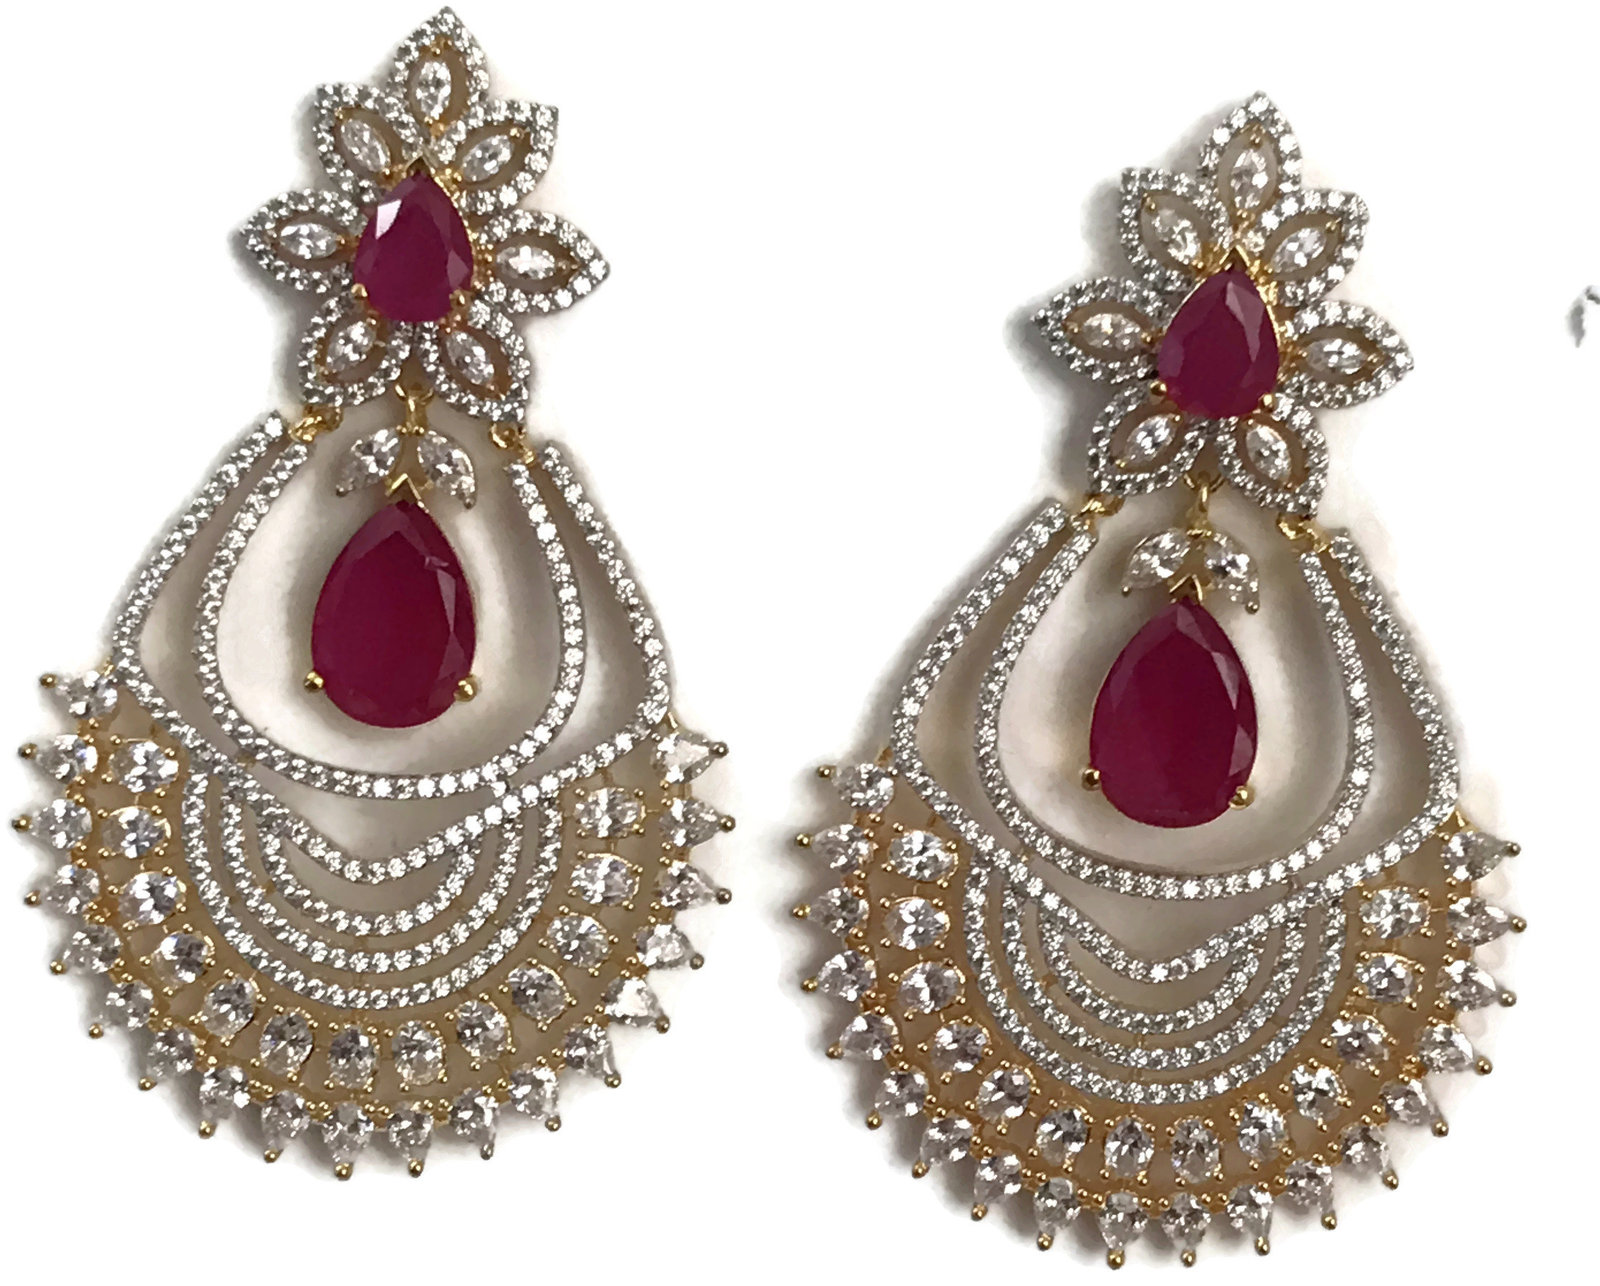 Ea e196 Bollywood Fashion white Polki & simulated Ruby stones golden earring Set